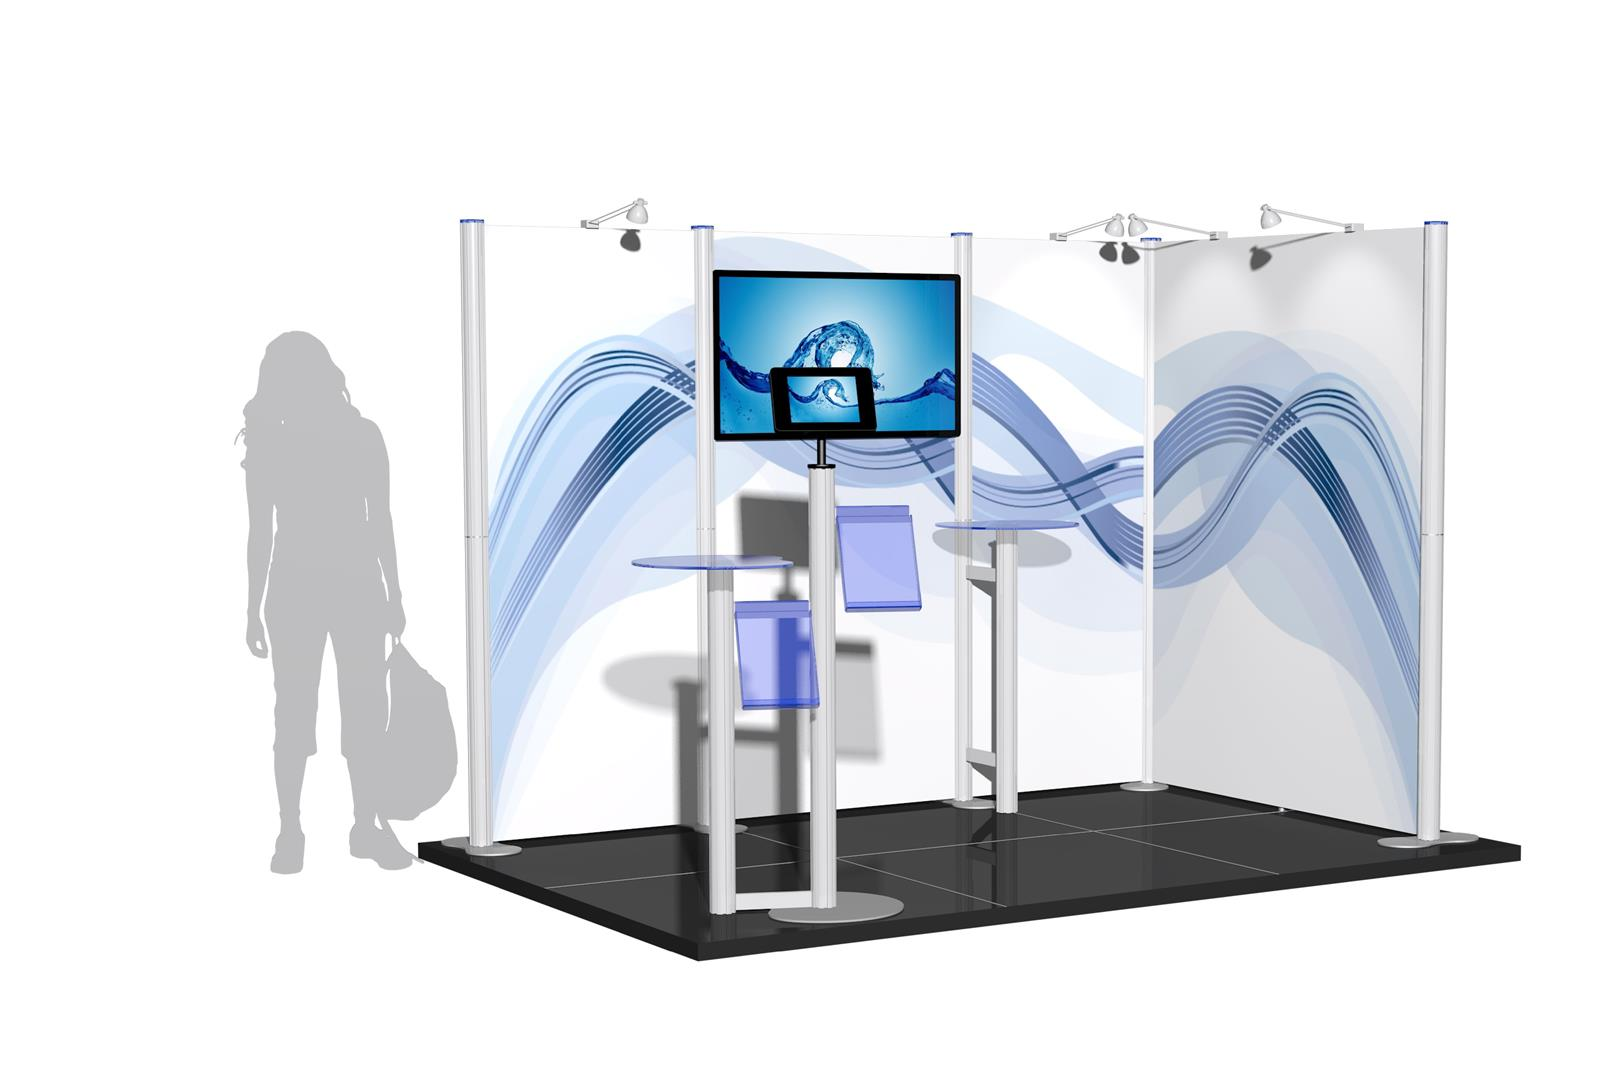 Centro 3m x 2m Modular Exhibition Stand - C3x2-2b